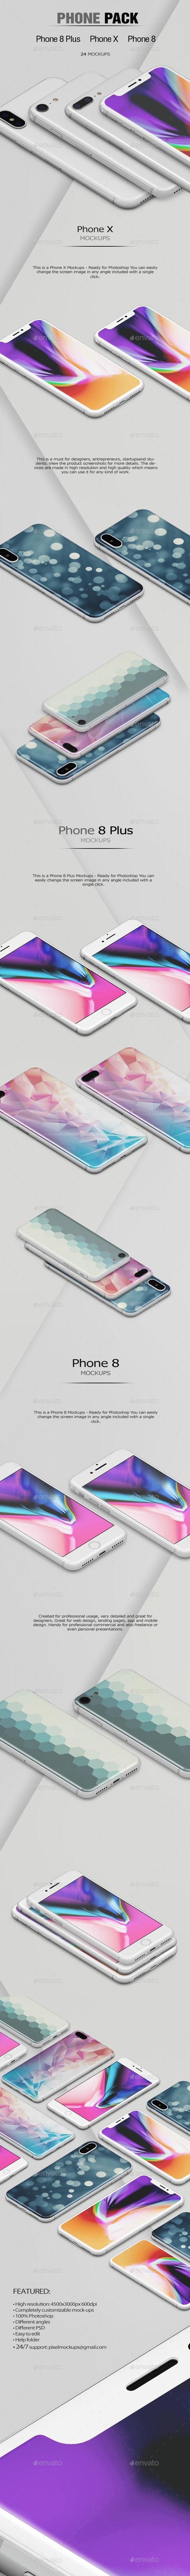 New Phones Pack Mockup 2017 - Product Mock-Ups Graphics